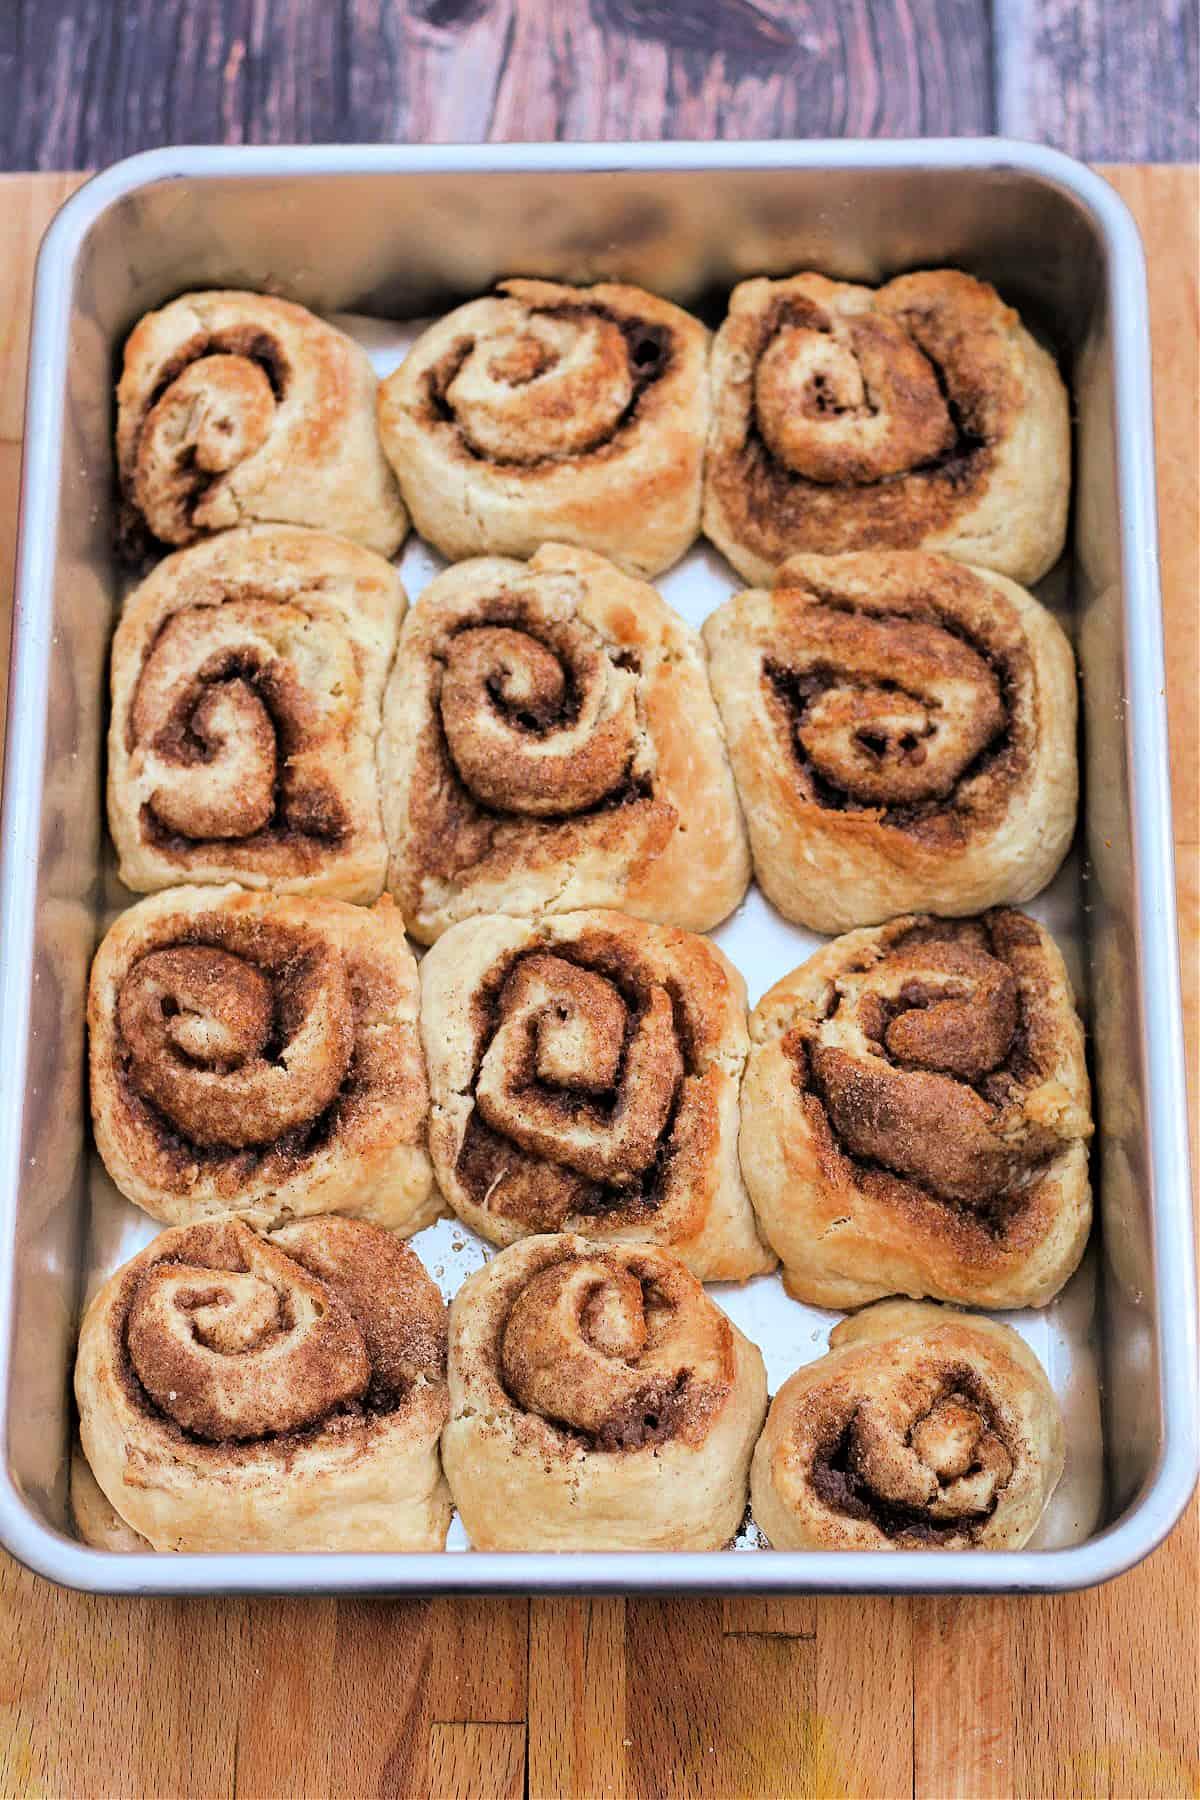 Baked cinnamon swirls in baking tin.